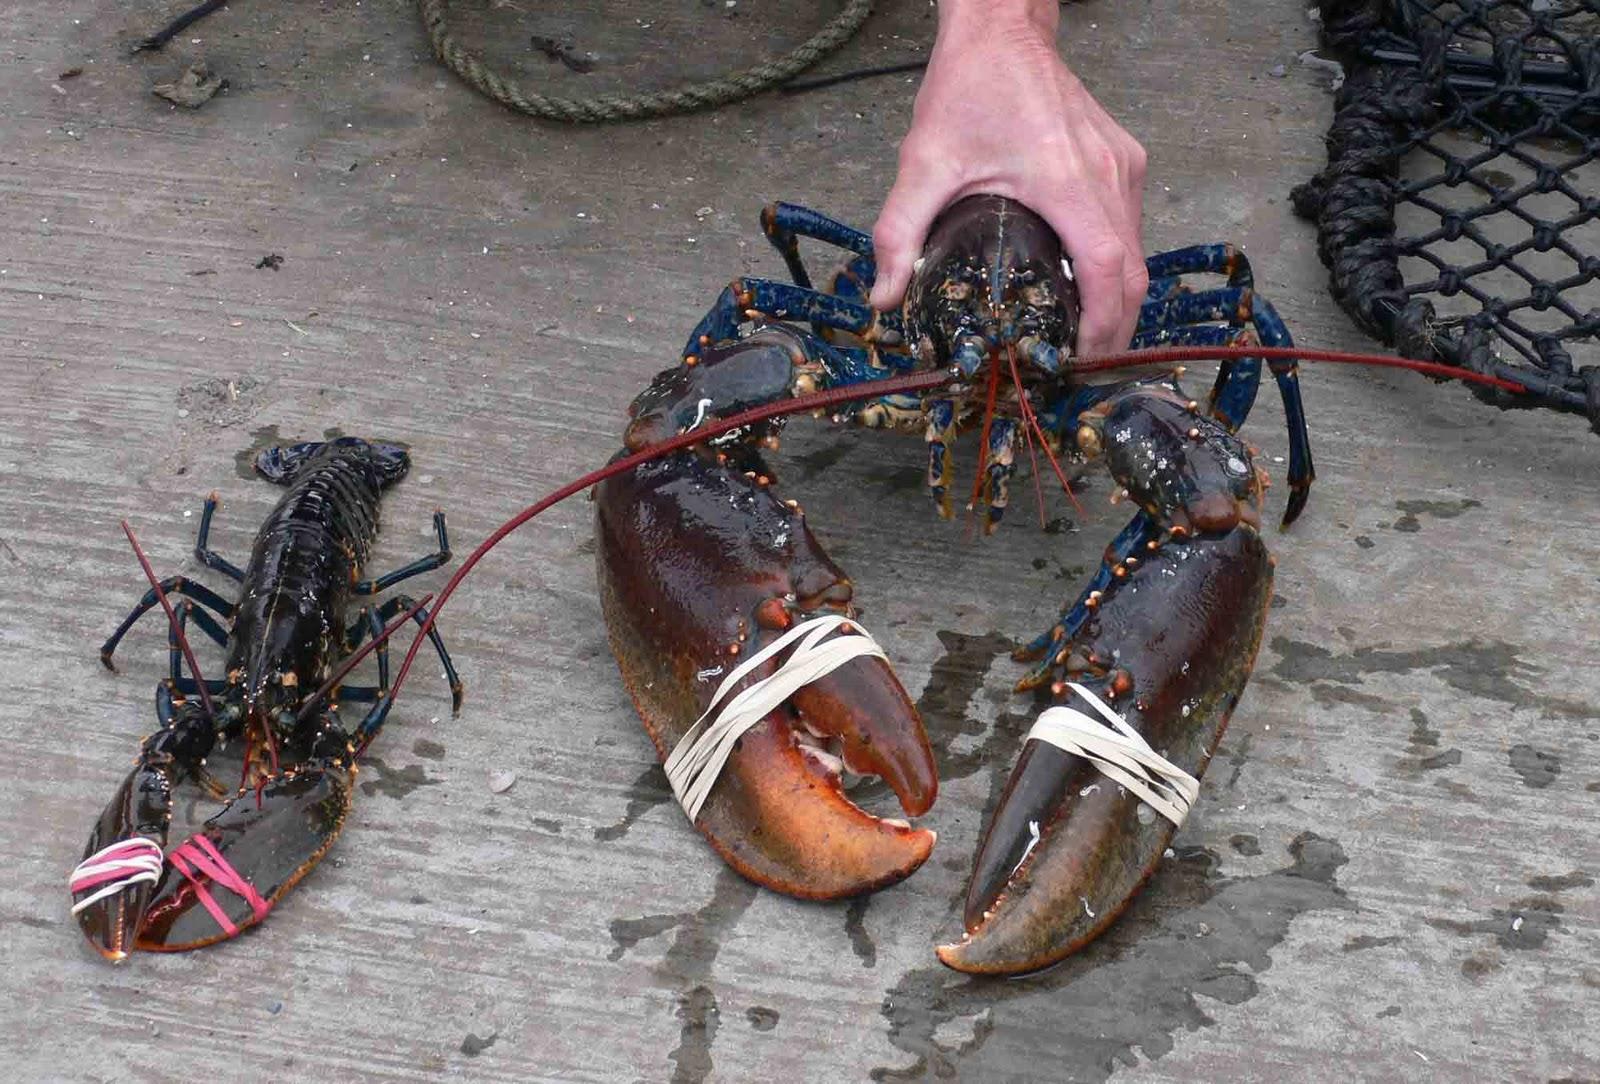 http://4.bp.blogspot.com/_h8PF1bPChlI/TGv1B4eHDGI/AAAAAAAAAy4/76OaqNiTDu8/s1600/king-lobster-2.jpg